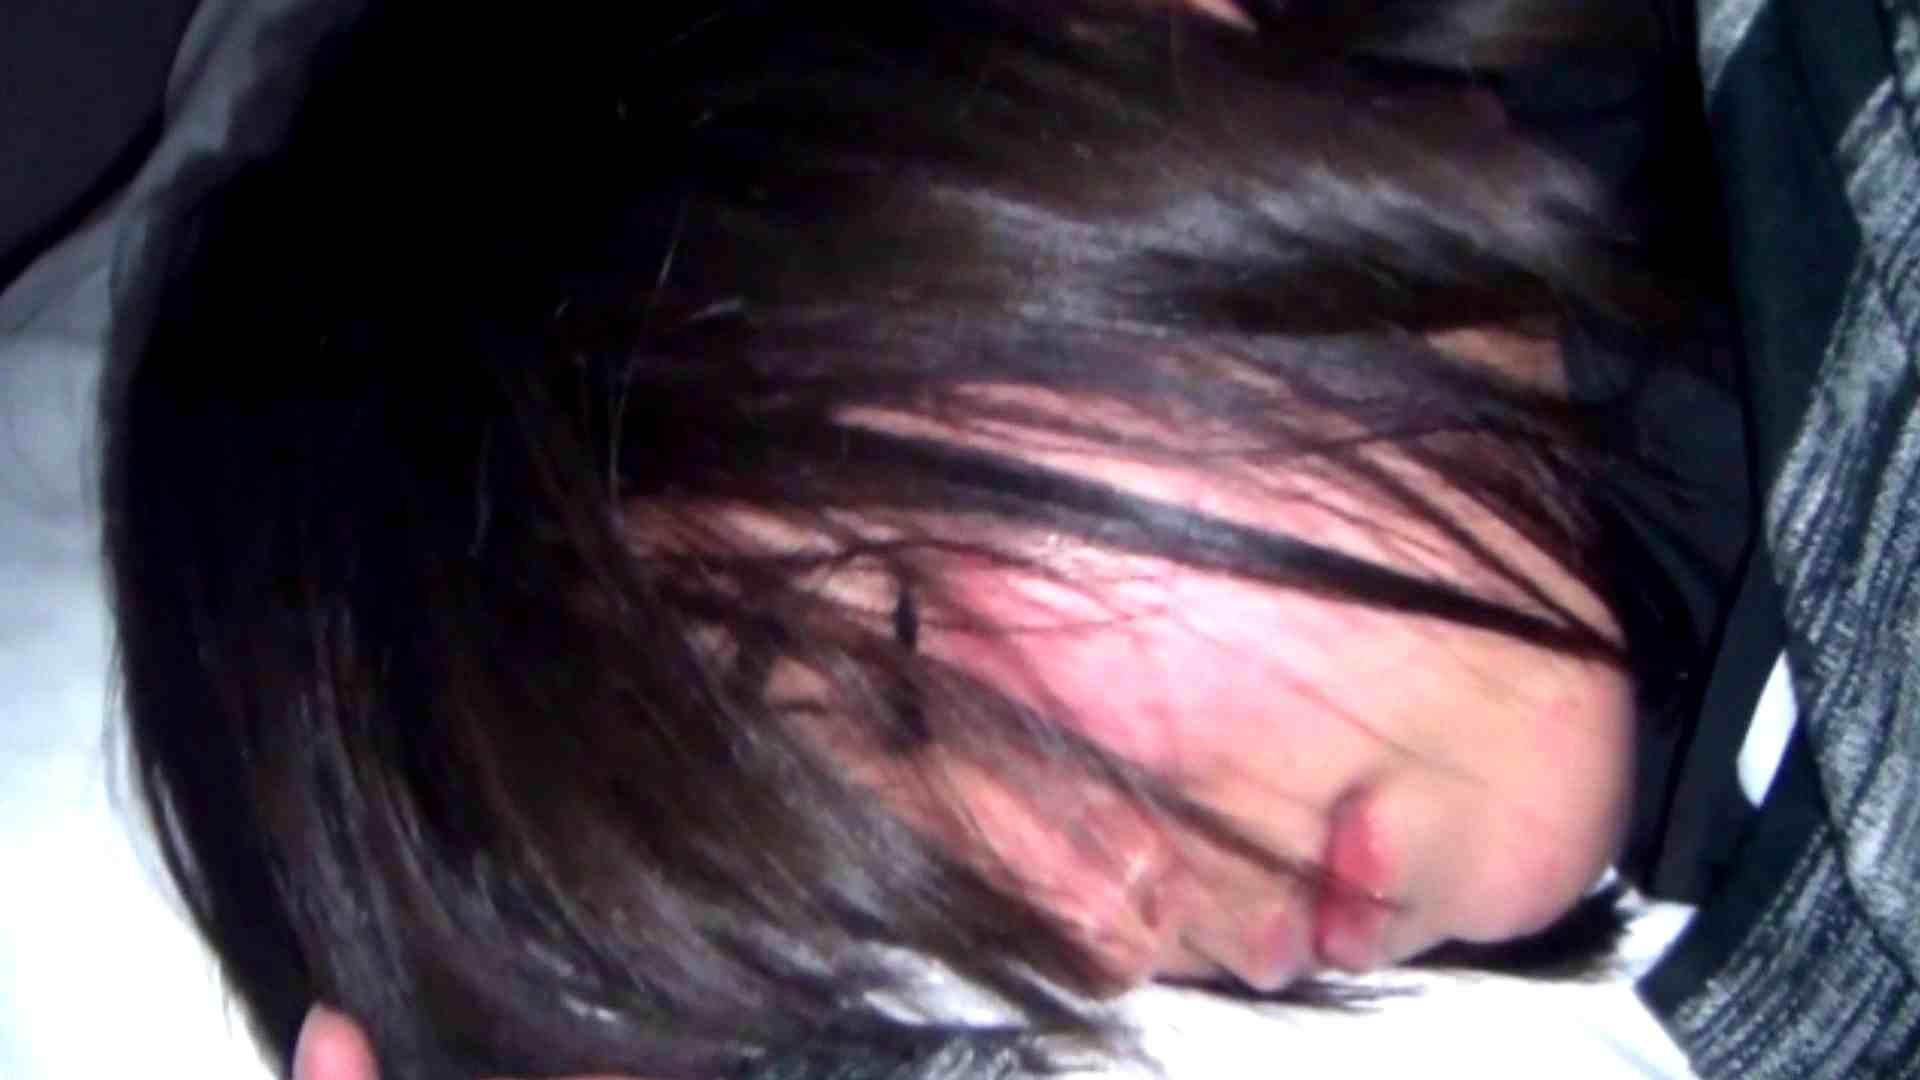 vol.34 【AIちゃん】 黒髪19歳 夏休みのプチ家出中 1回目 いじくり  78枚 15